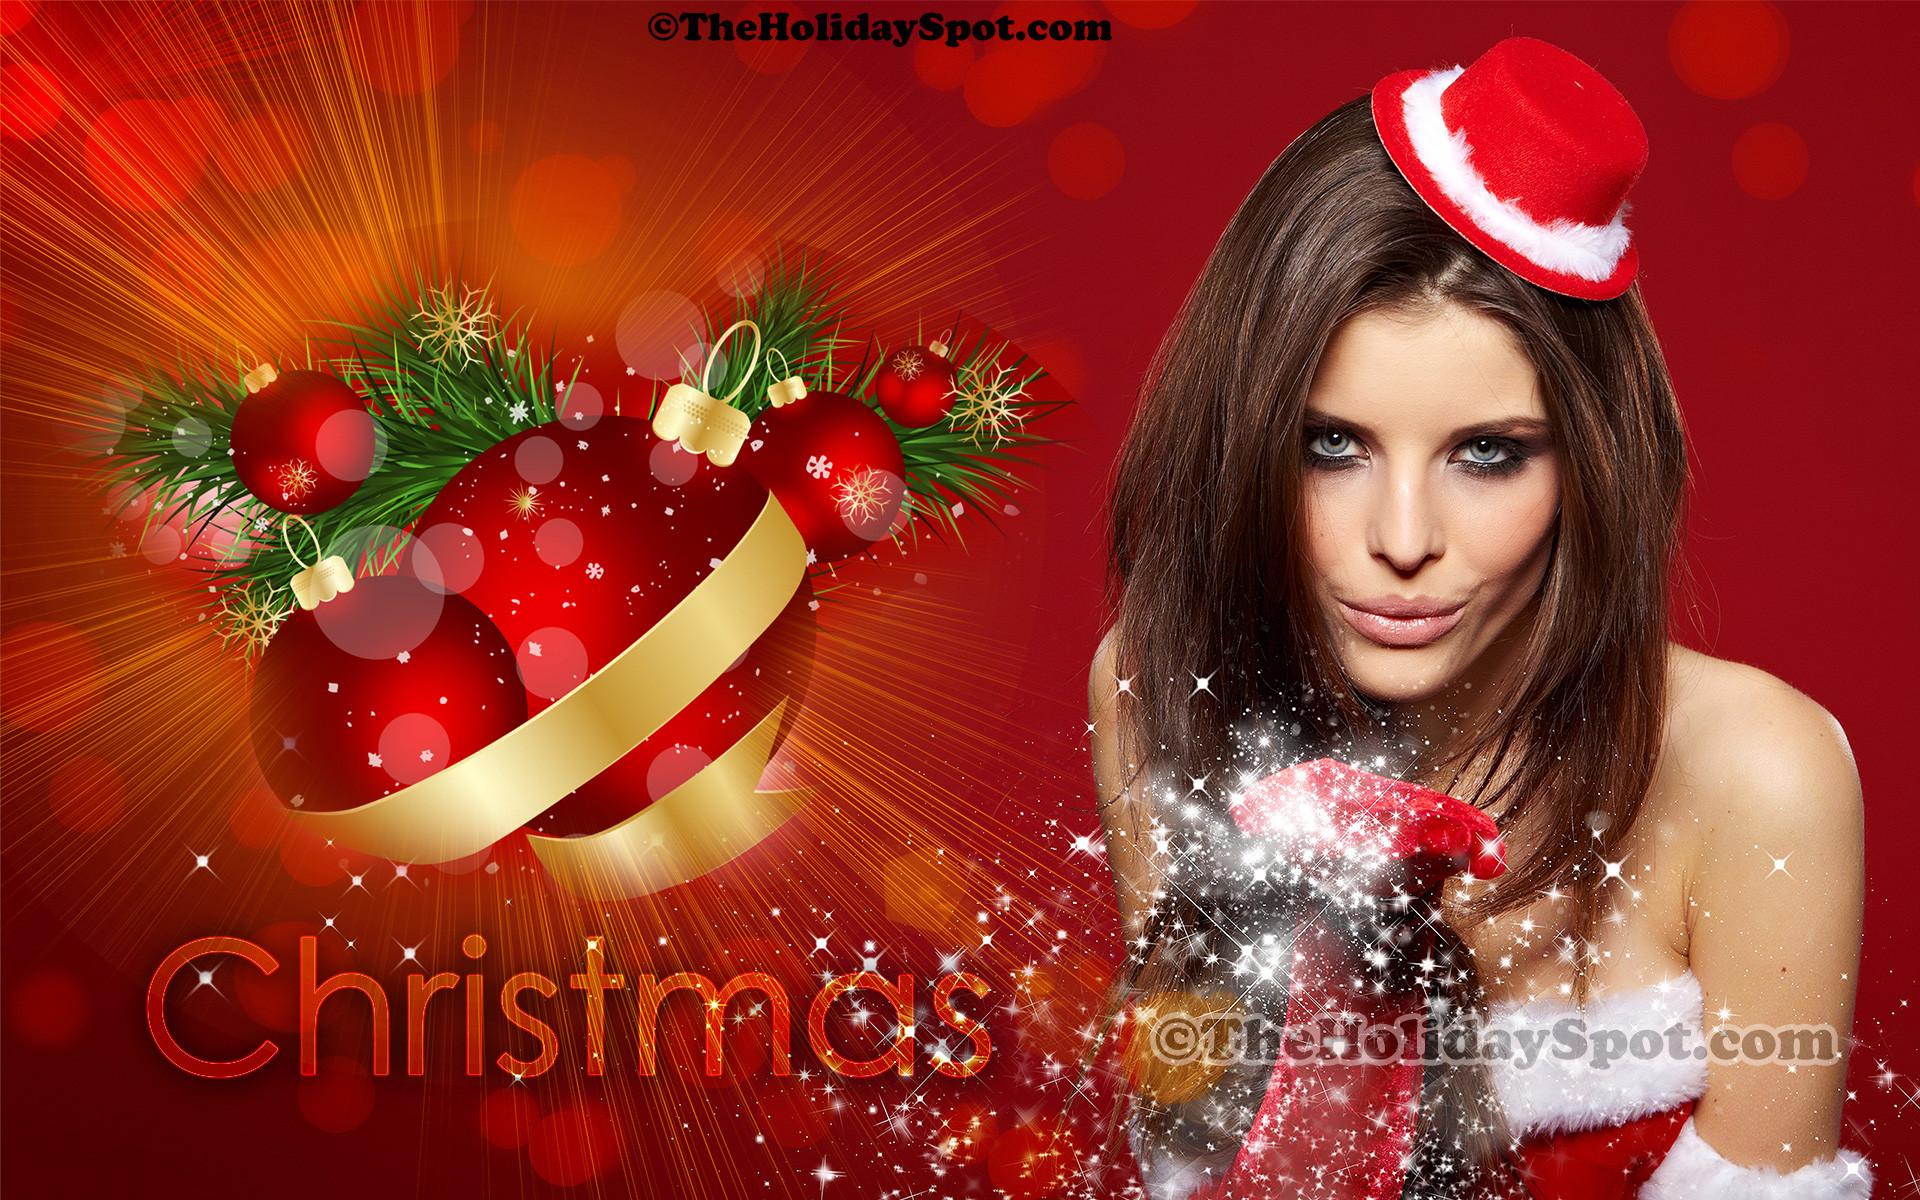 A wonderful Christmas wallpaper showing the spirit of celebration.